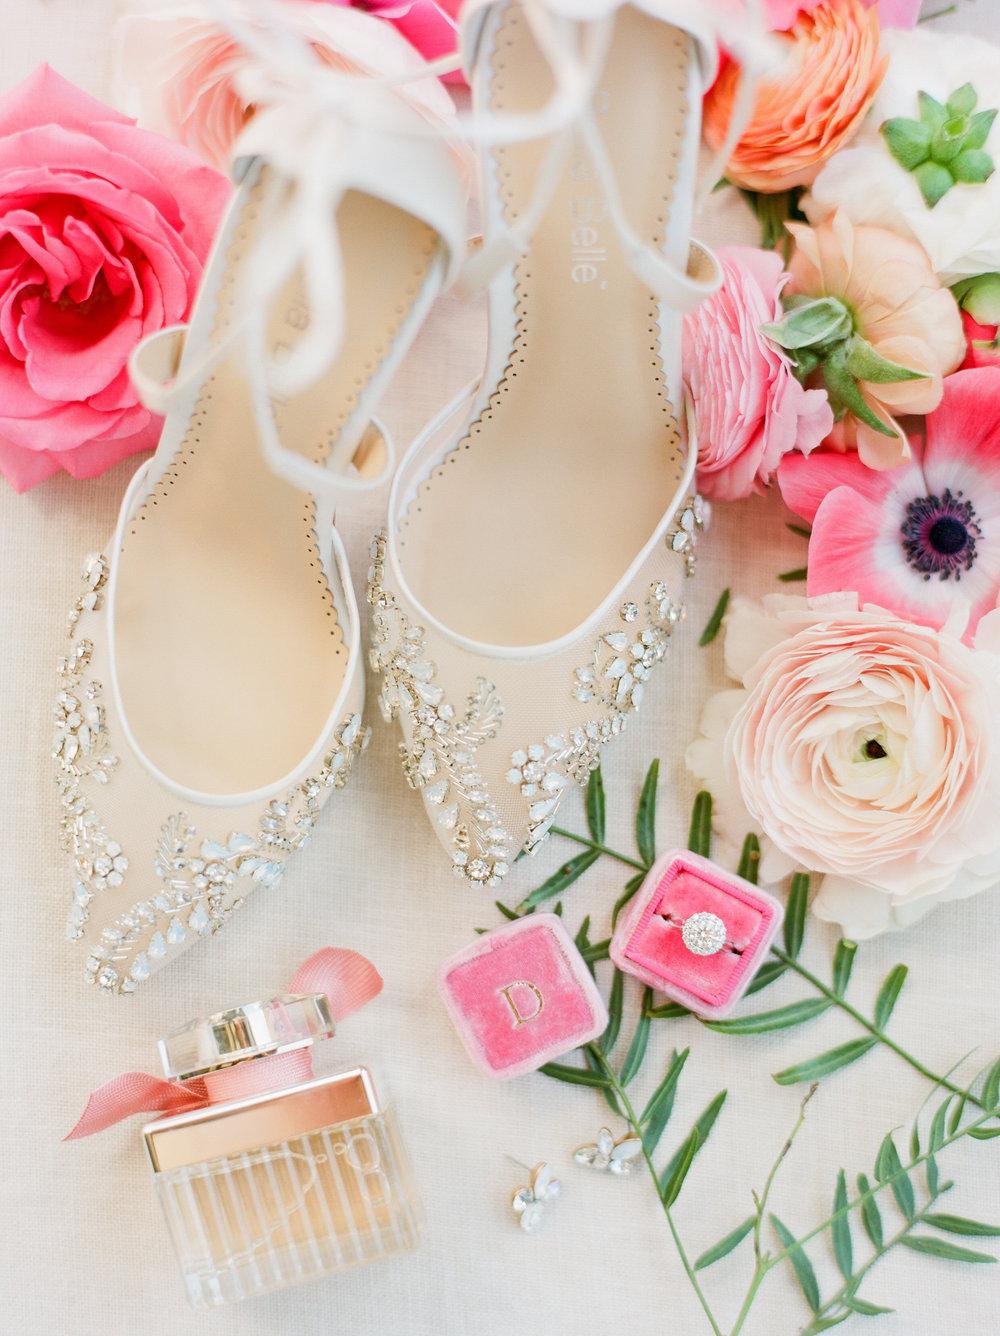 The-Knot-50-Weddings-50-States-Texas-Winner-Dana-Fernandez-photography-houston-wedding-photographer-film-fine-art-destination-4.jpg